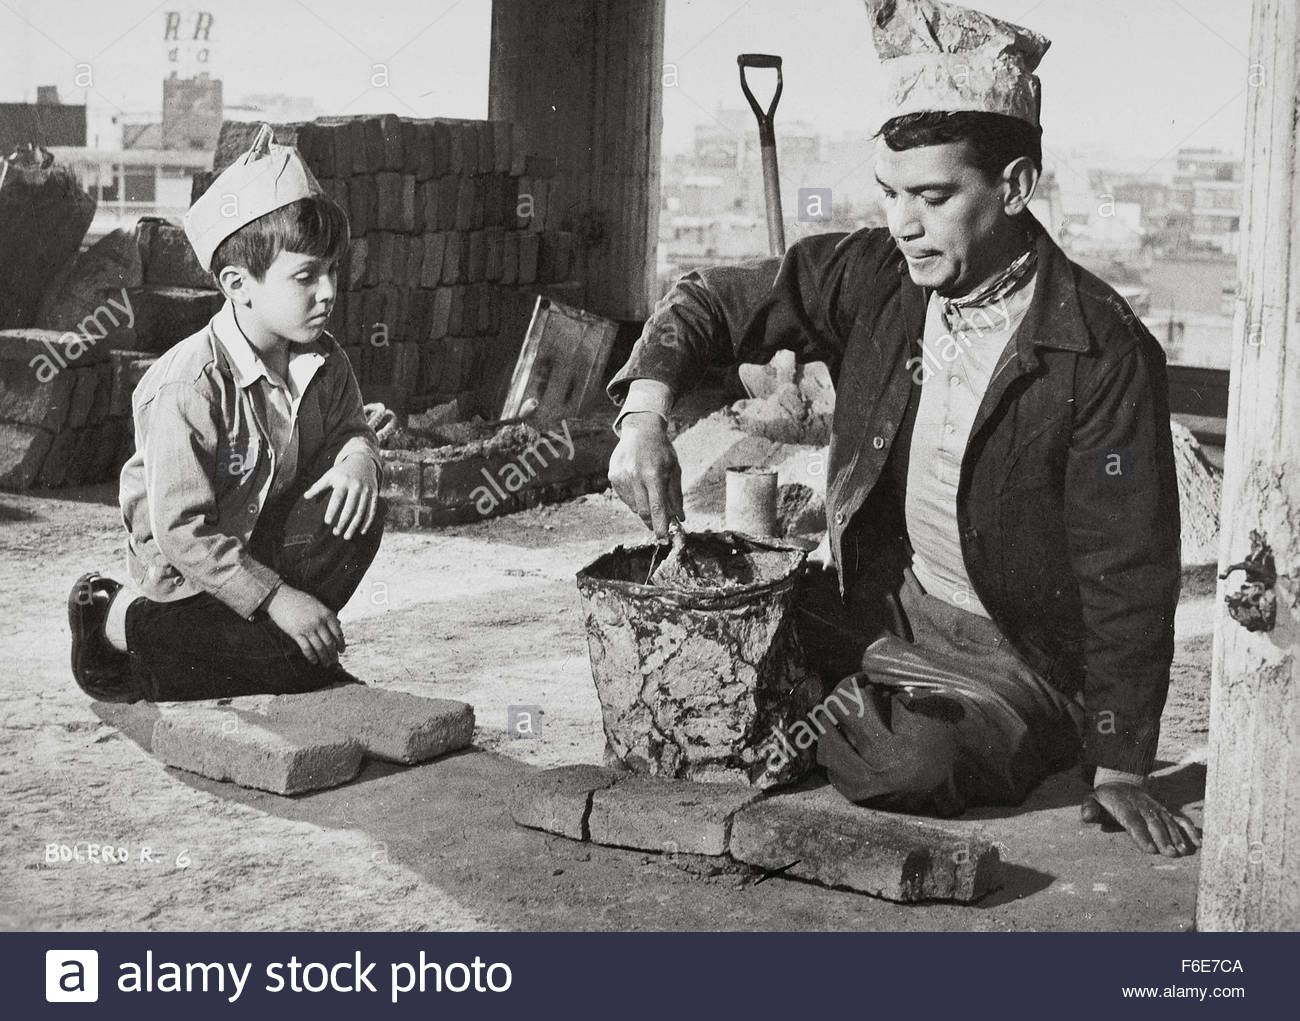 Download this stock image: 1956; El Bolero De Raquel. Original Film Title: